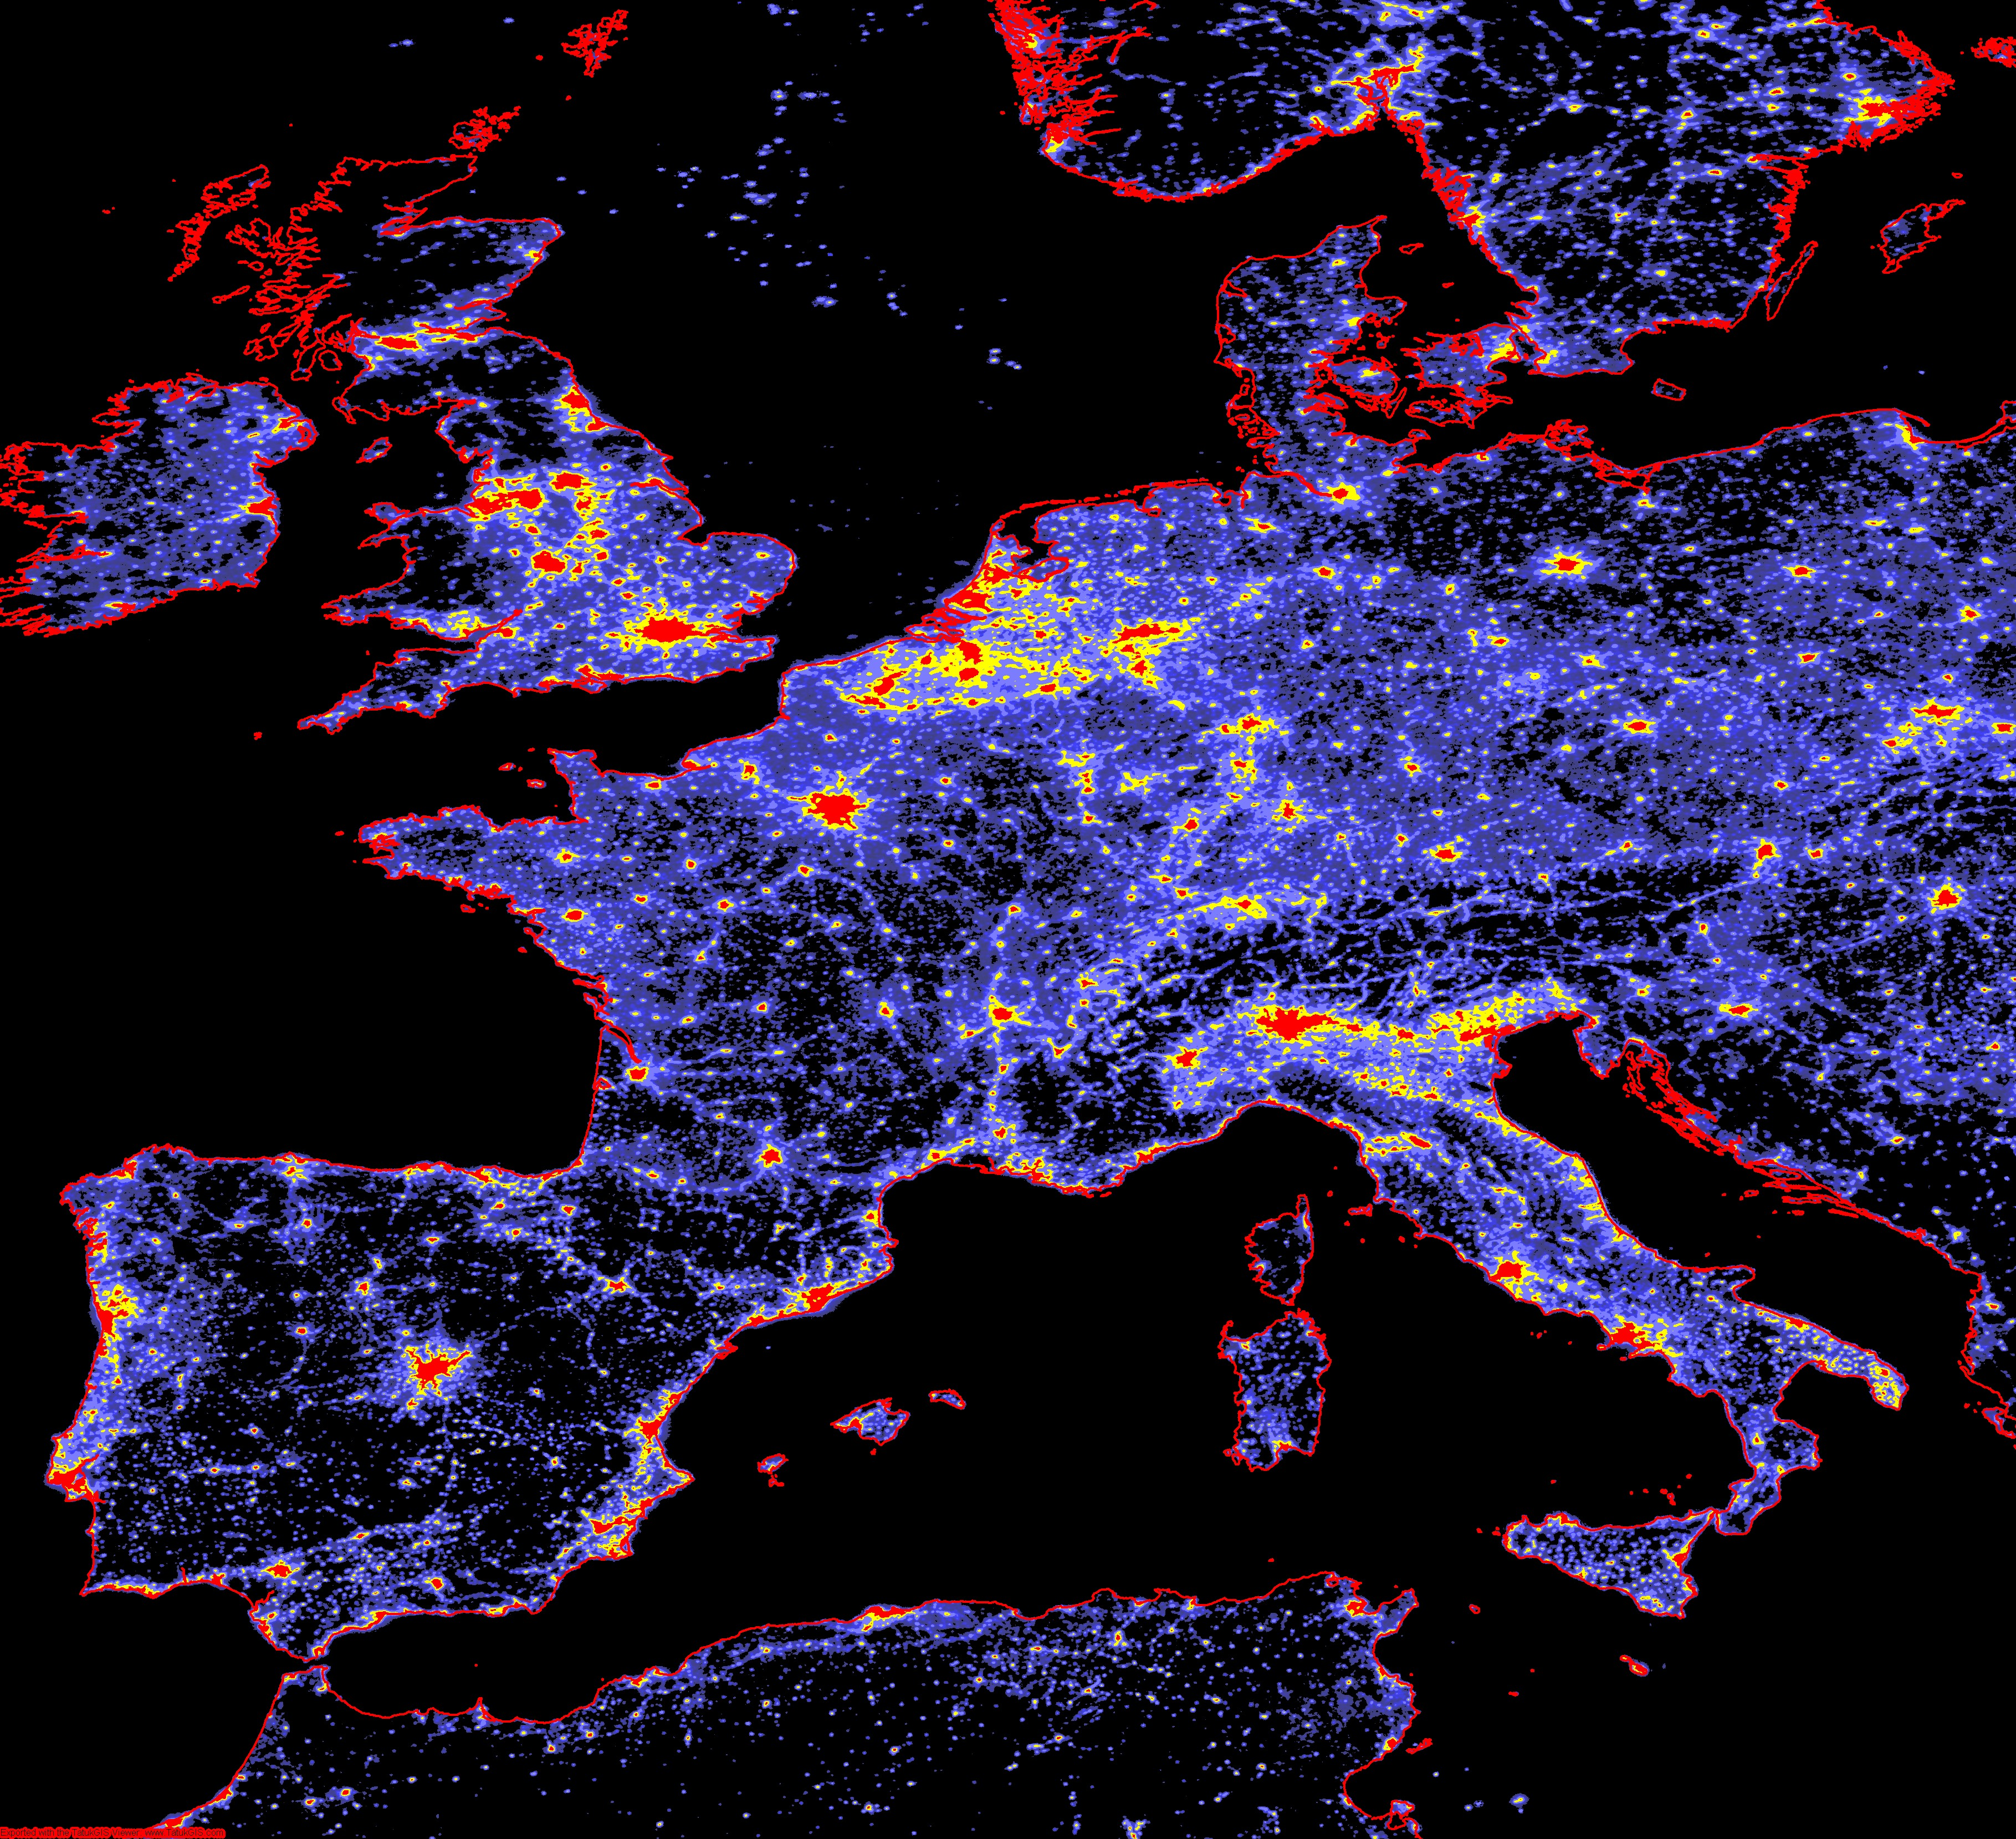 Dark Sky Initiative Gegen Lichtverschmutzung - Dark sky map